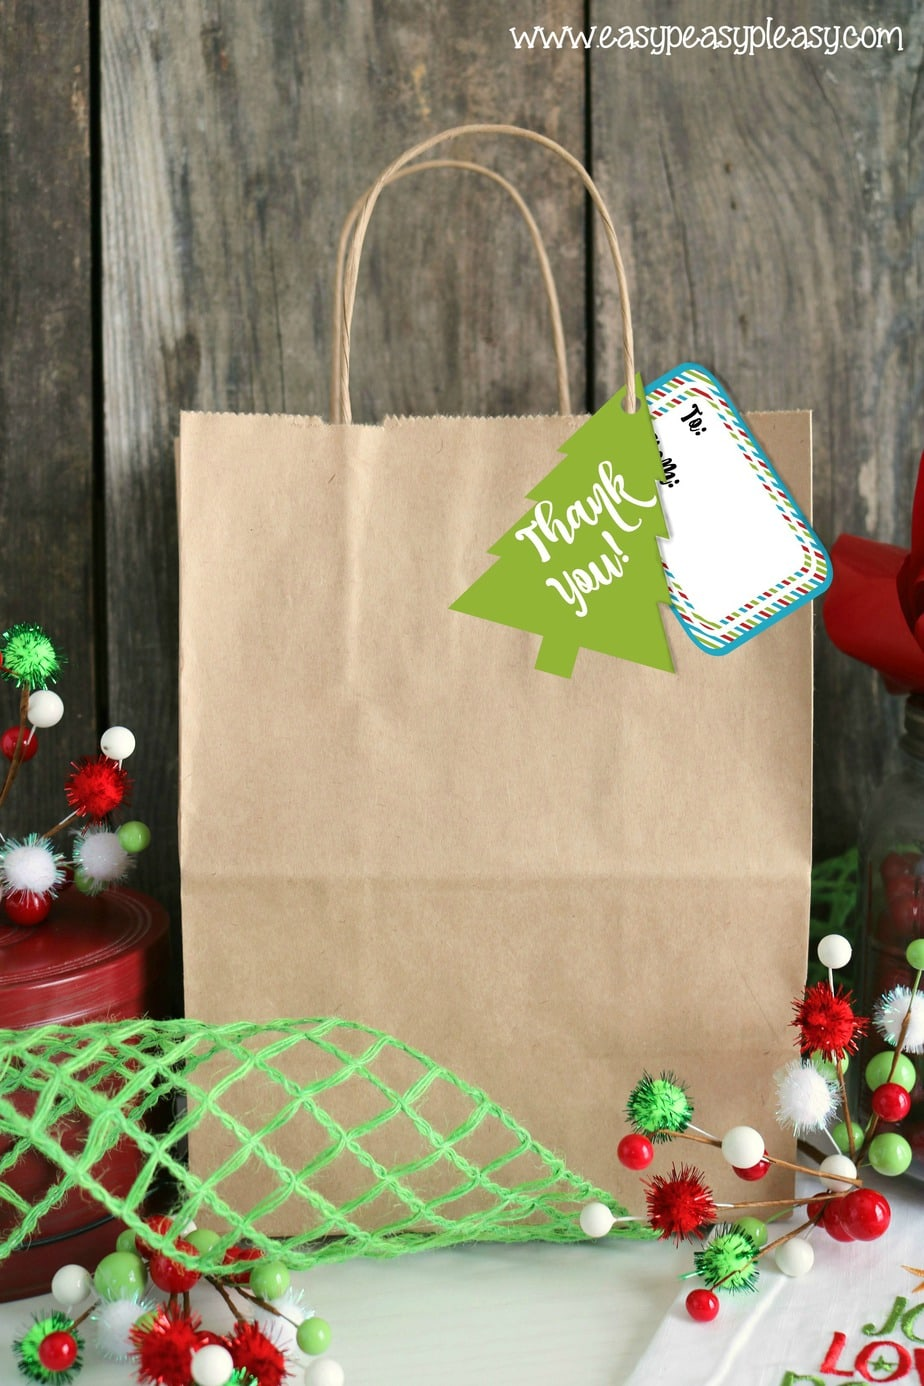 Free Printable Holiday Hostess Gift Tags - Easy Peasy Pleasy